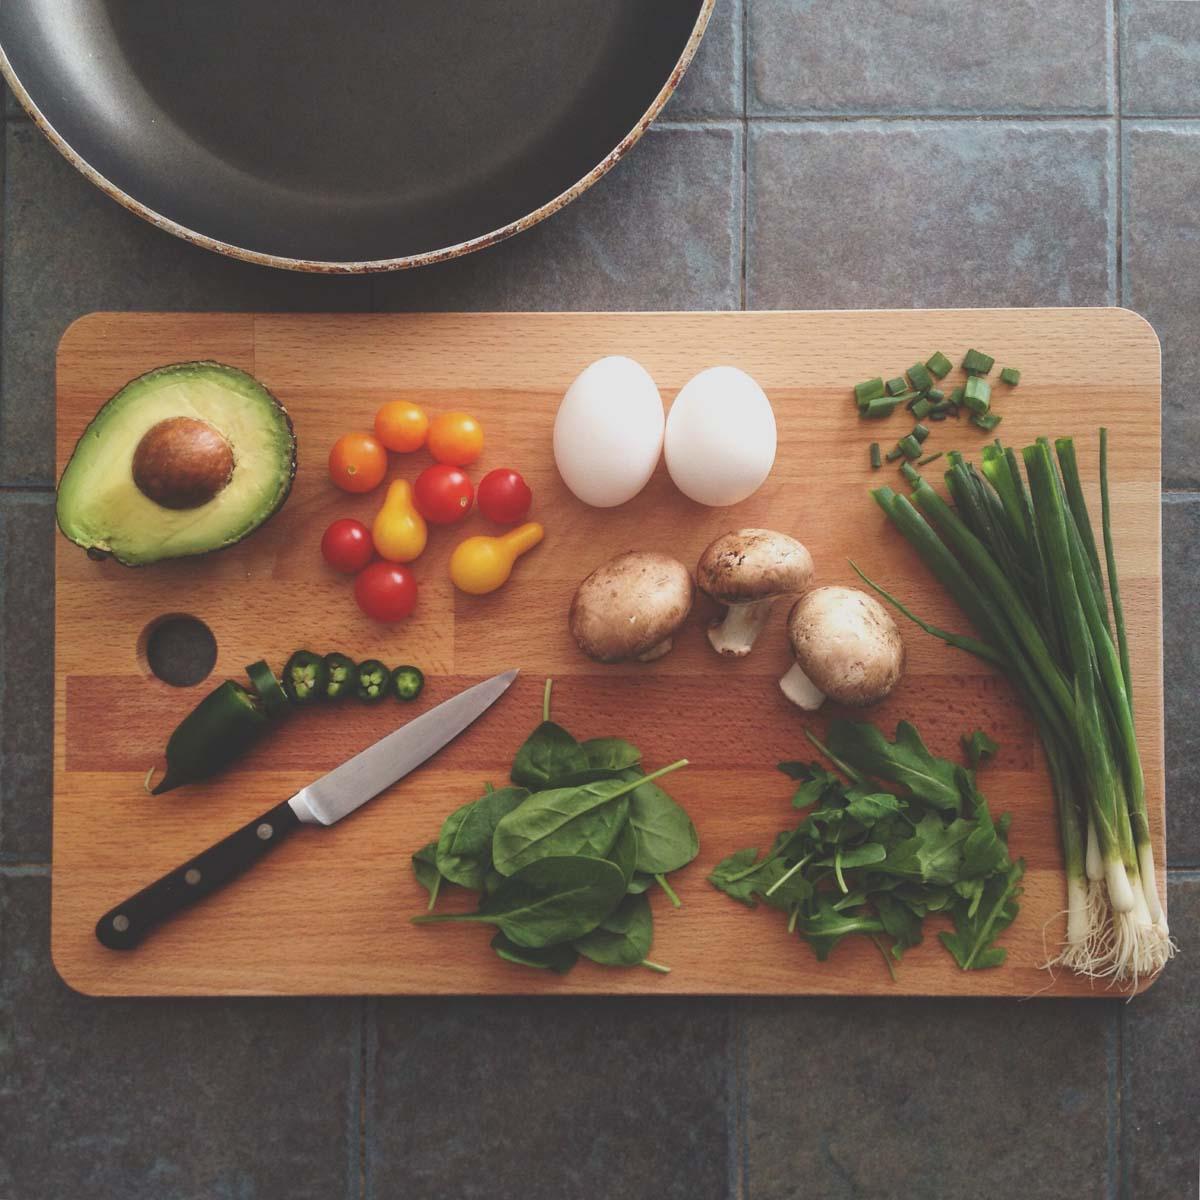 easy ways to add veggies-1